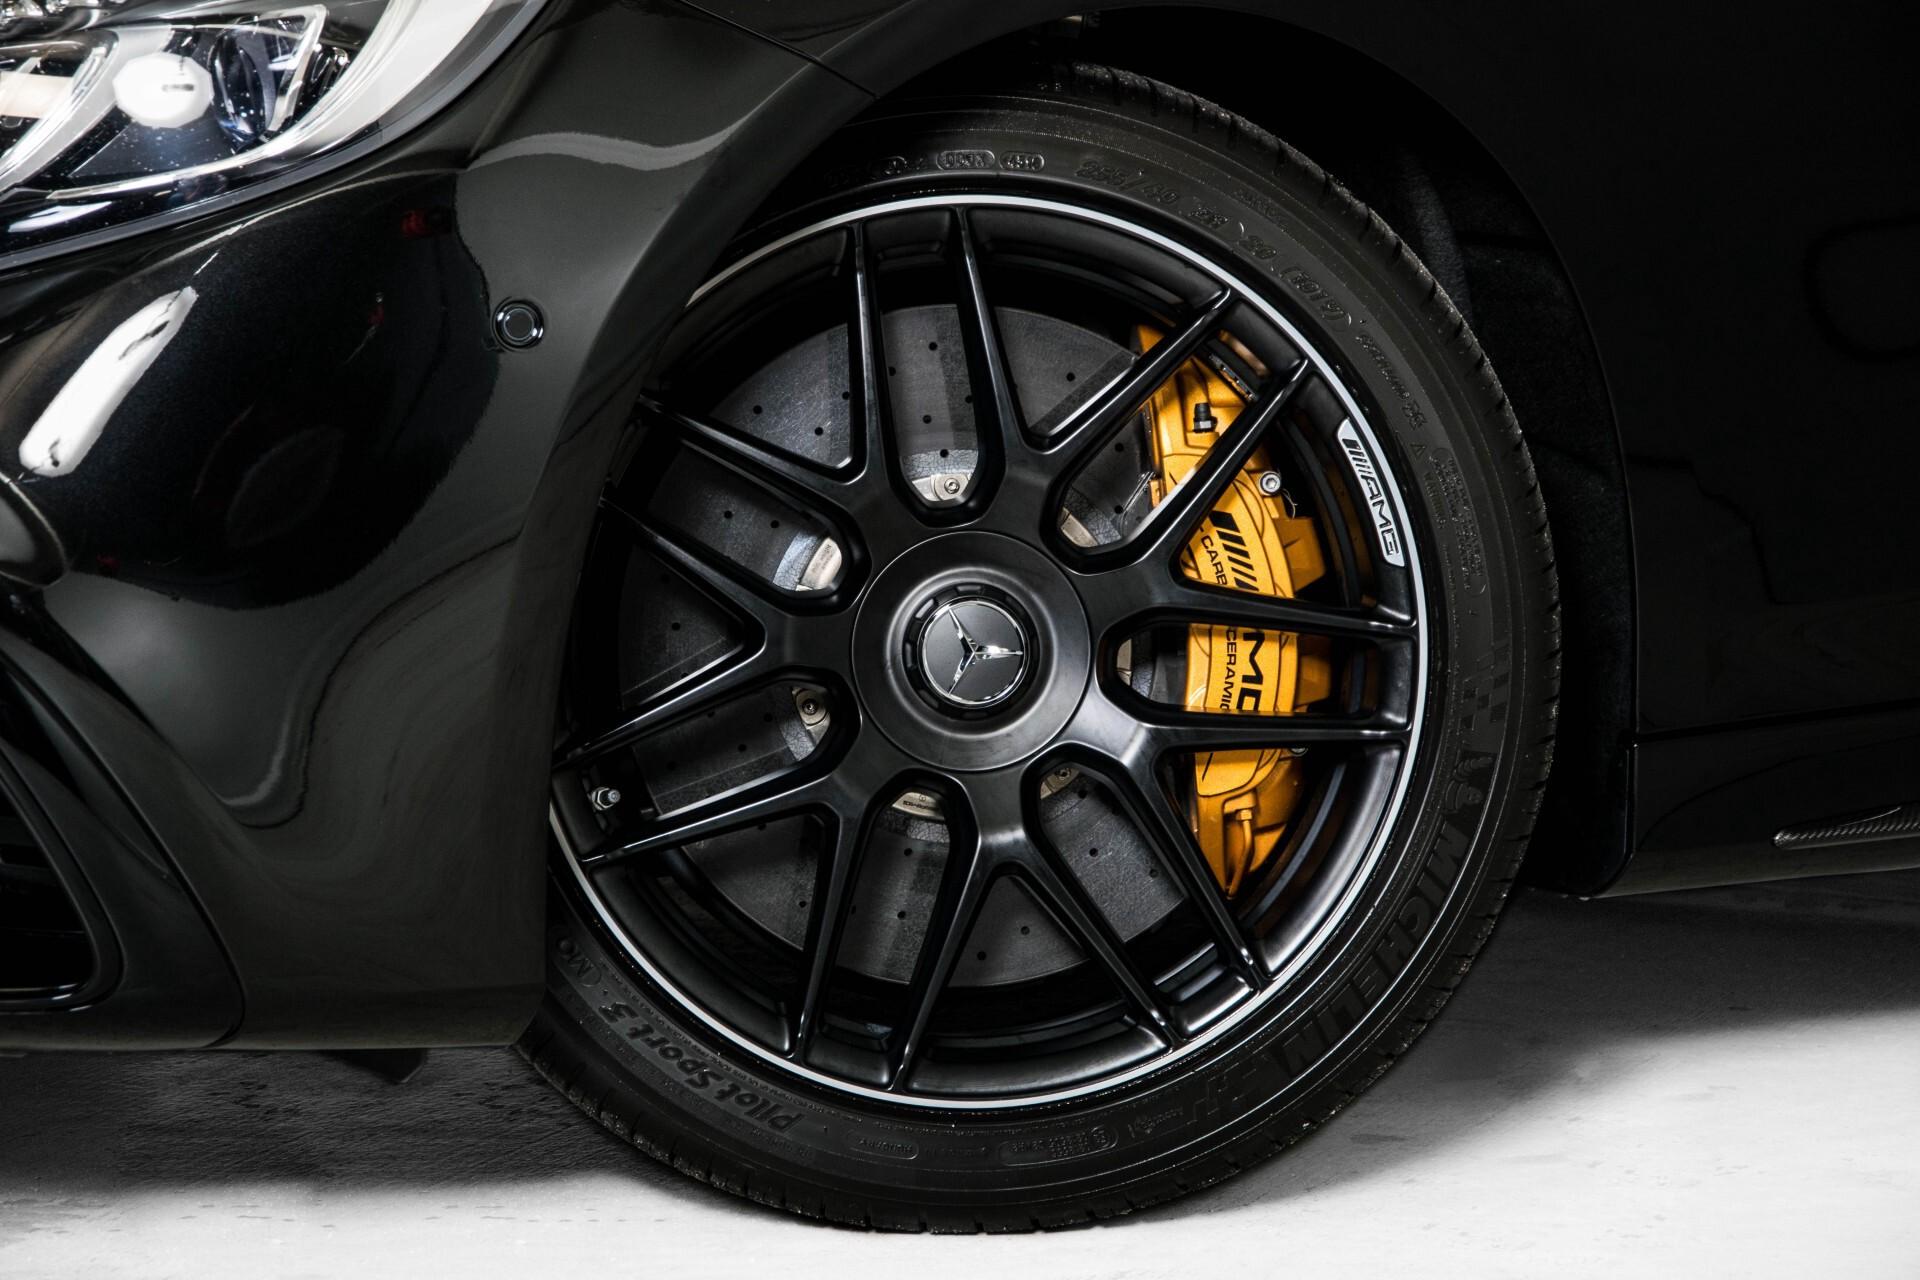 Mercedes-Benz S-Klasse Cabrio 63 AMG 4-M Ceramic/Designo/Carbon/Burmester High End Aut Foto 69